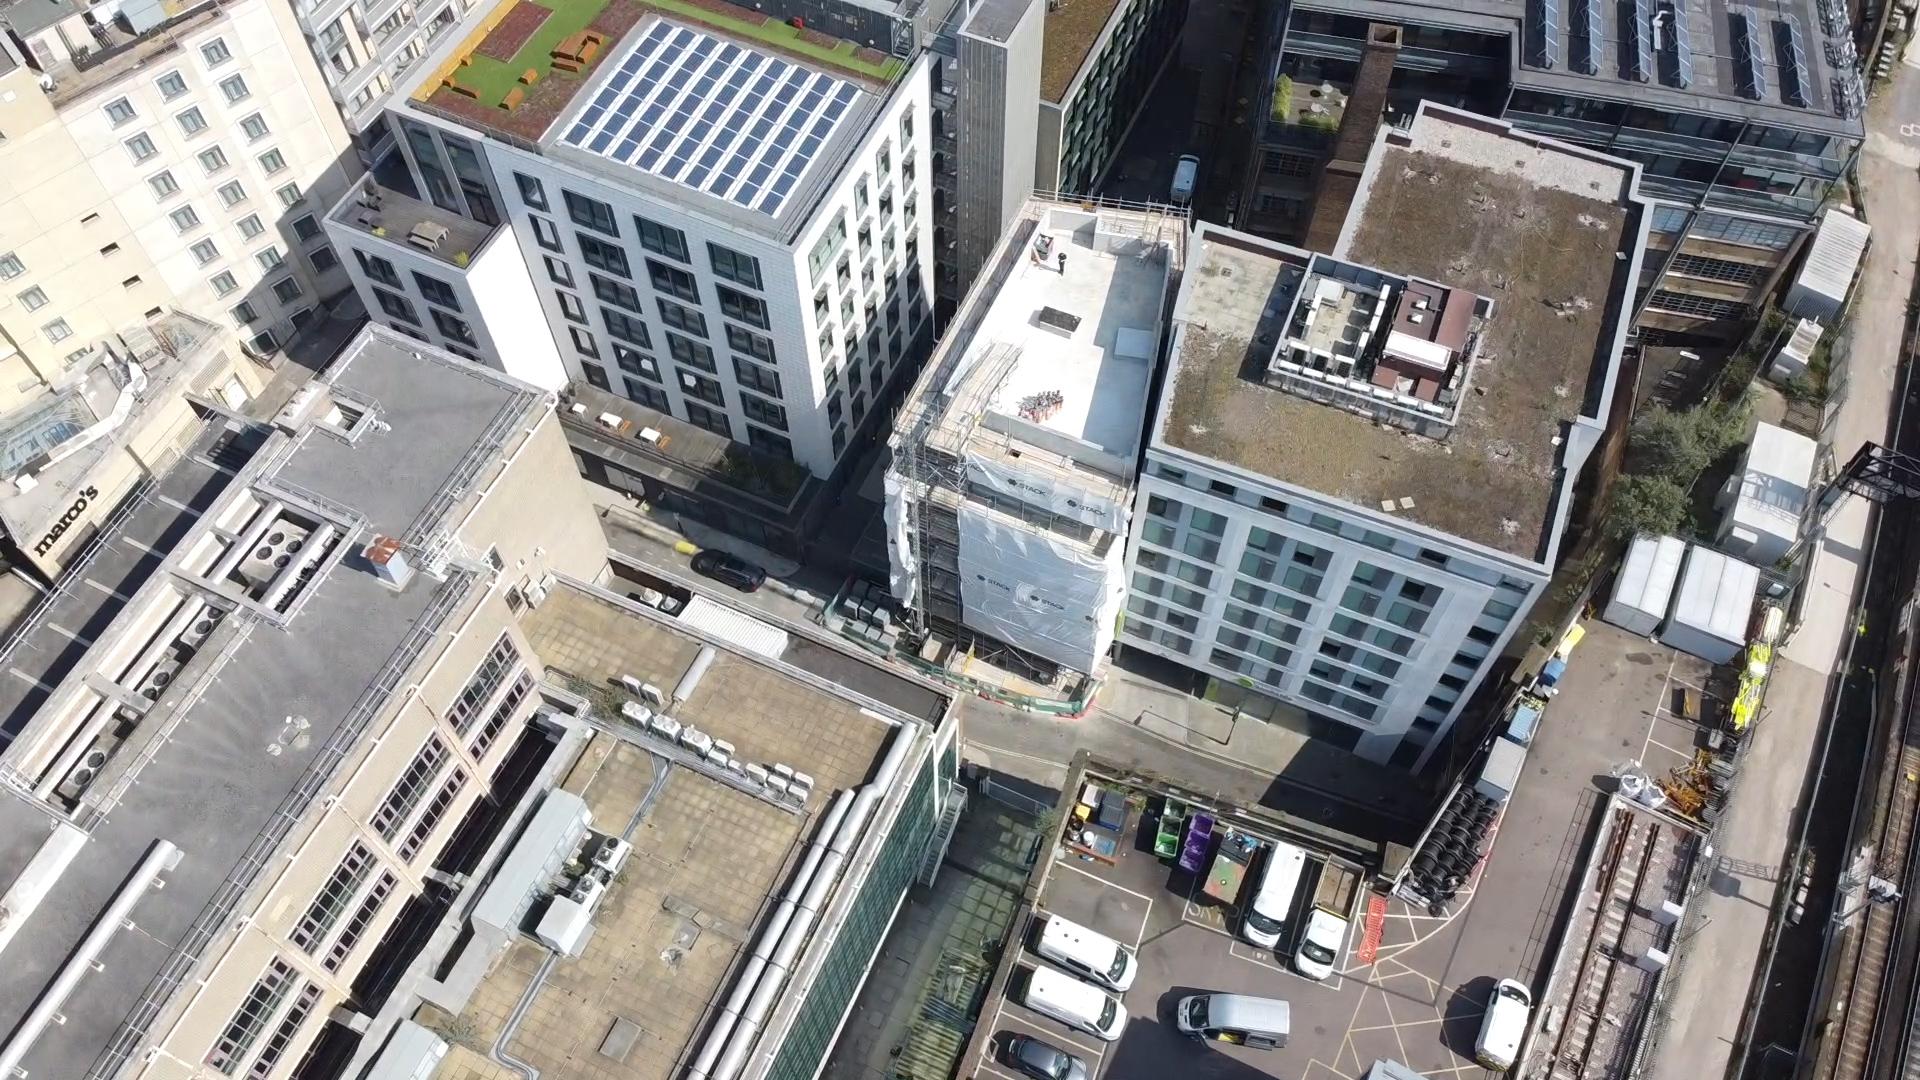 Ewer Street. residential development